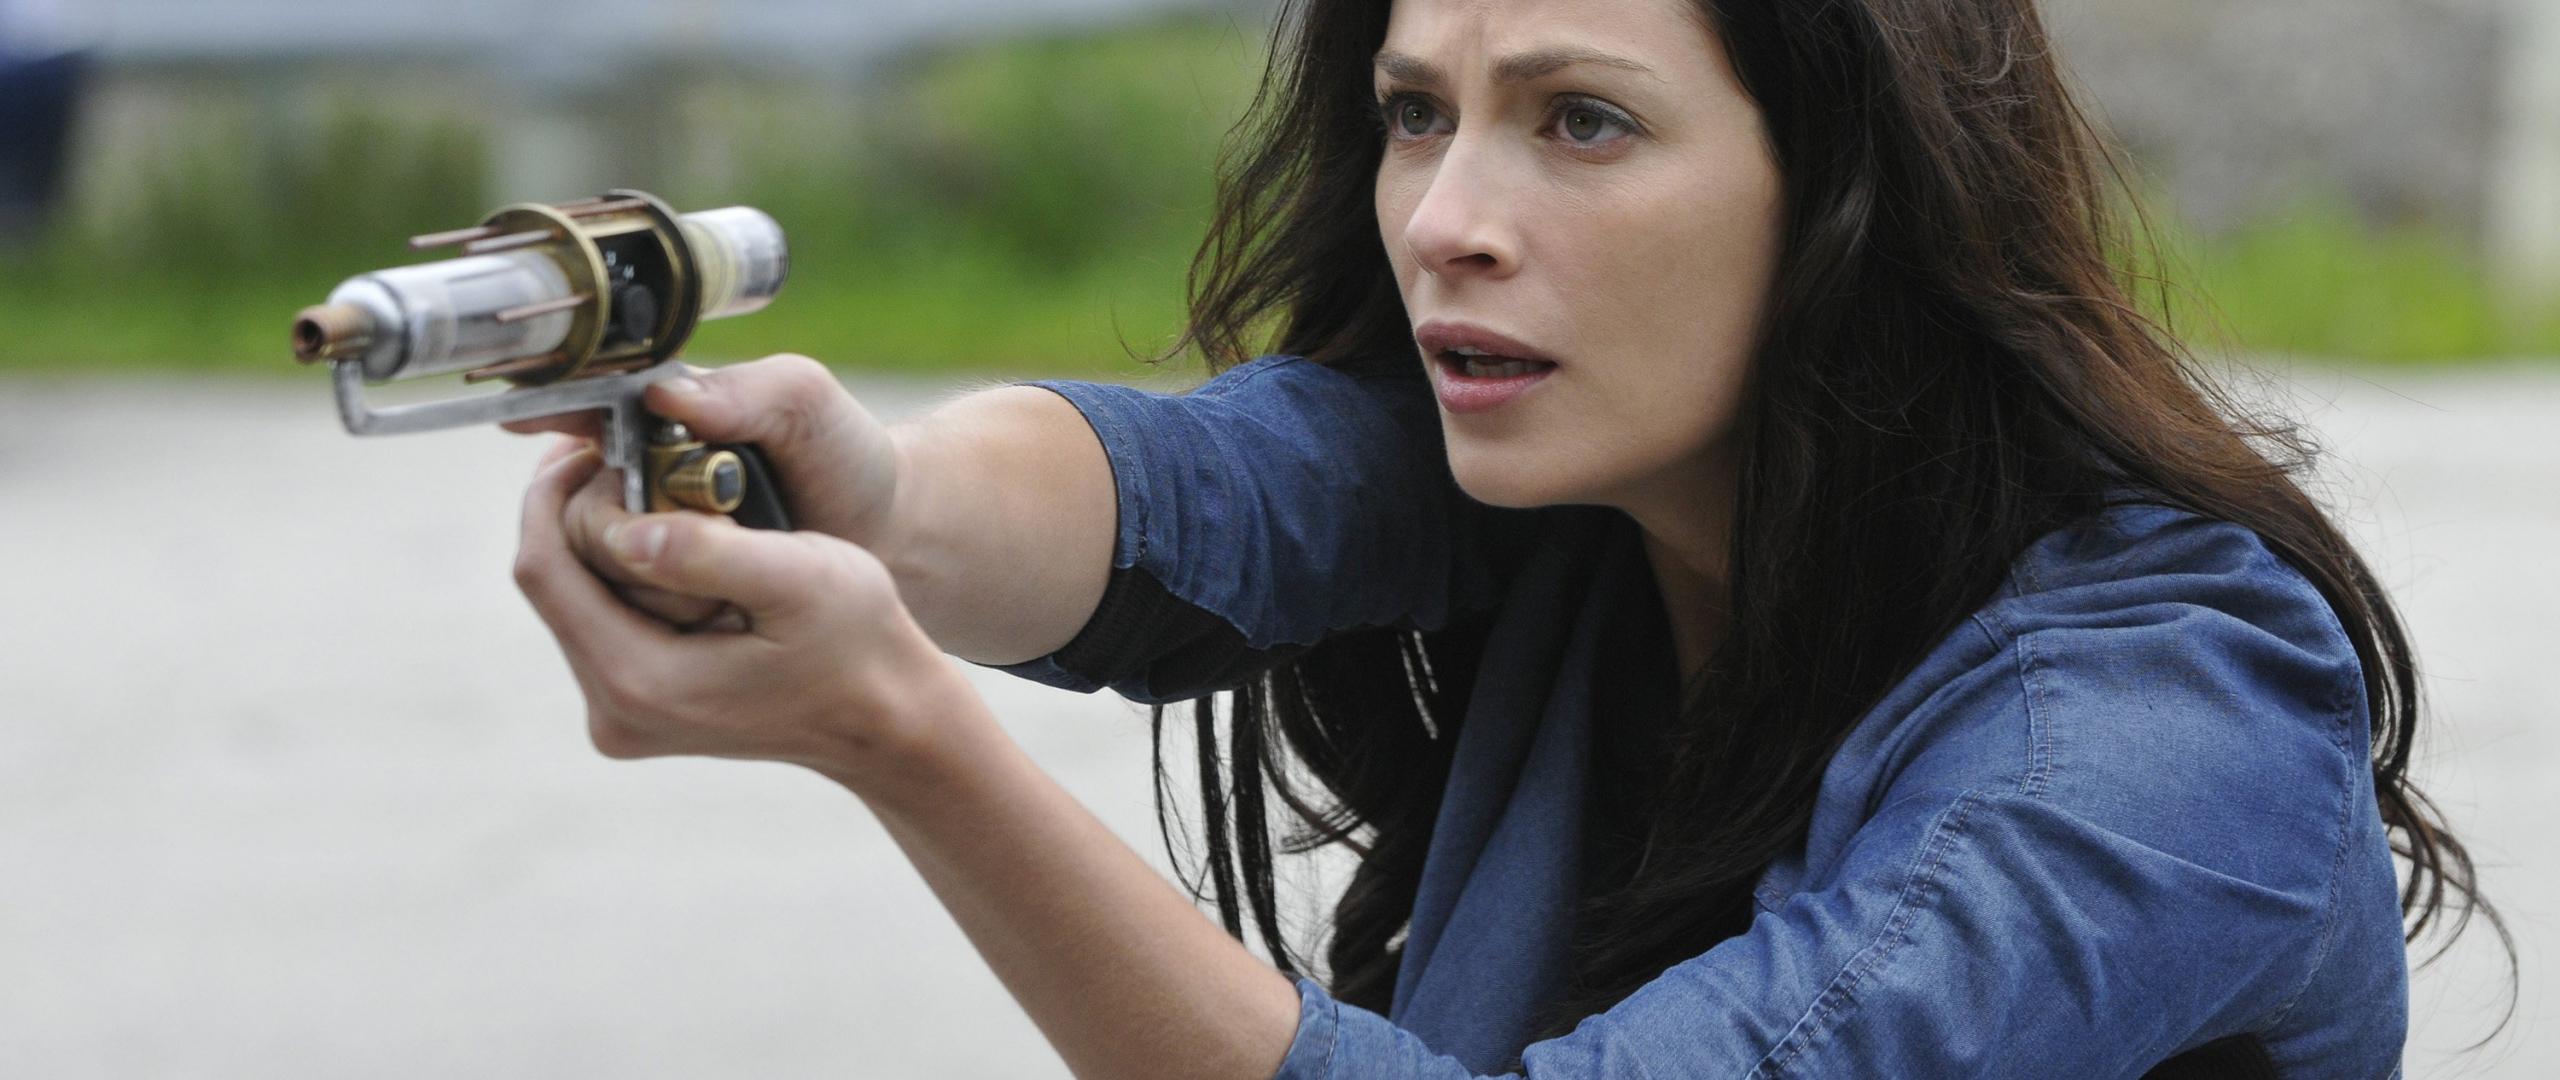 2560x1080 wallpaper Actress, Joanne Kelly, Warehouse 13 TV series